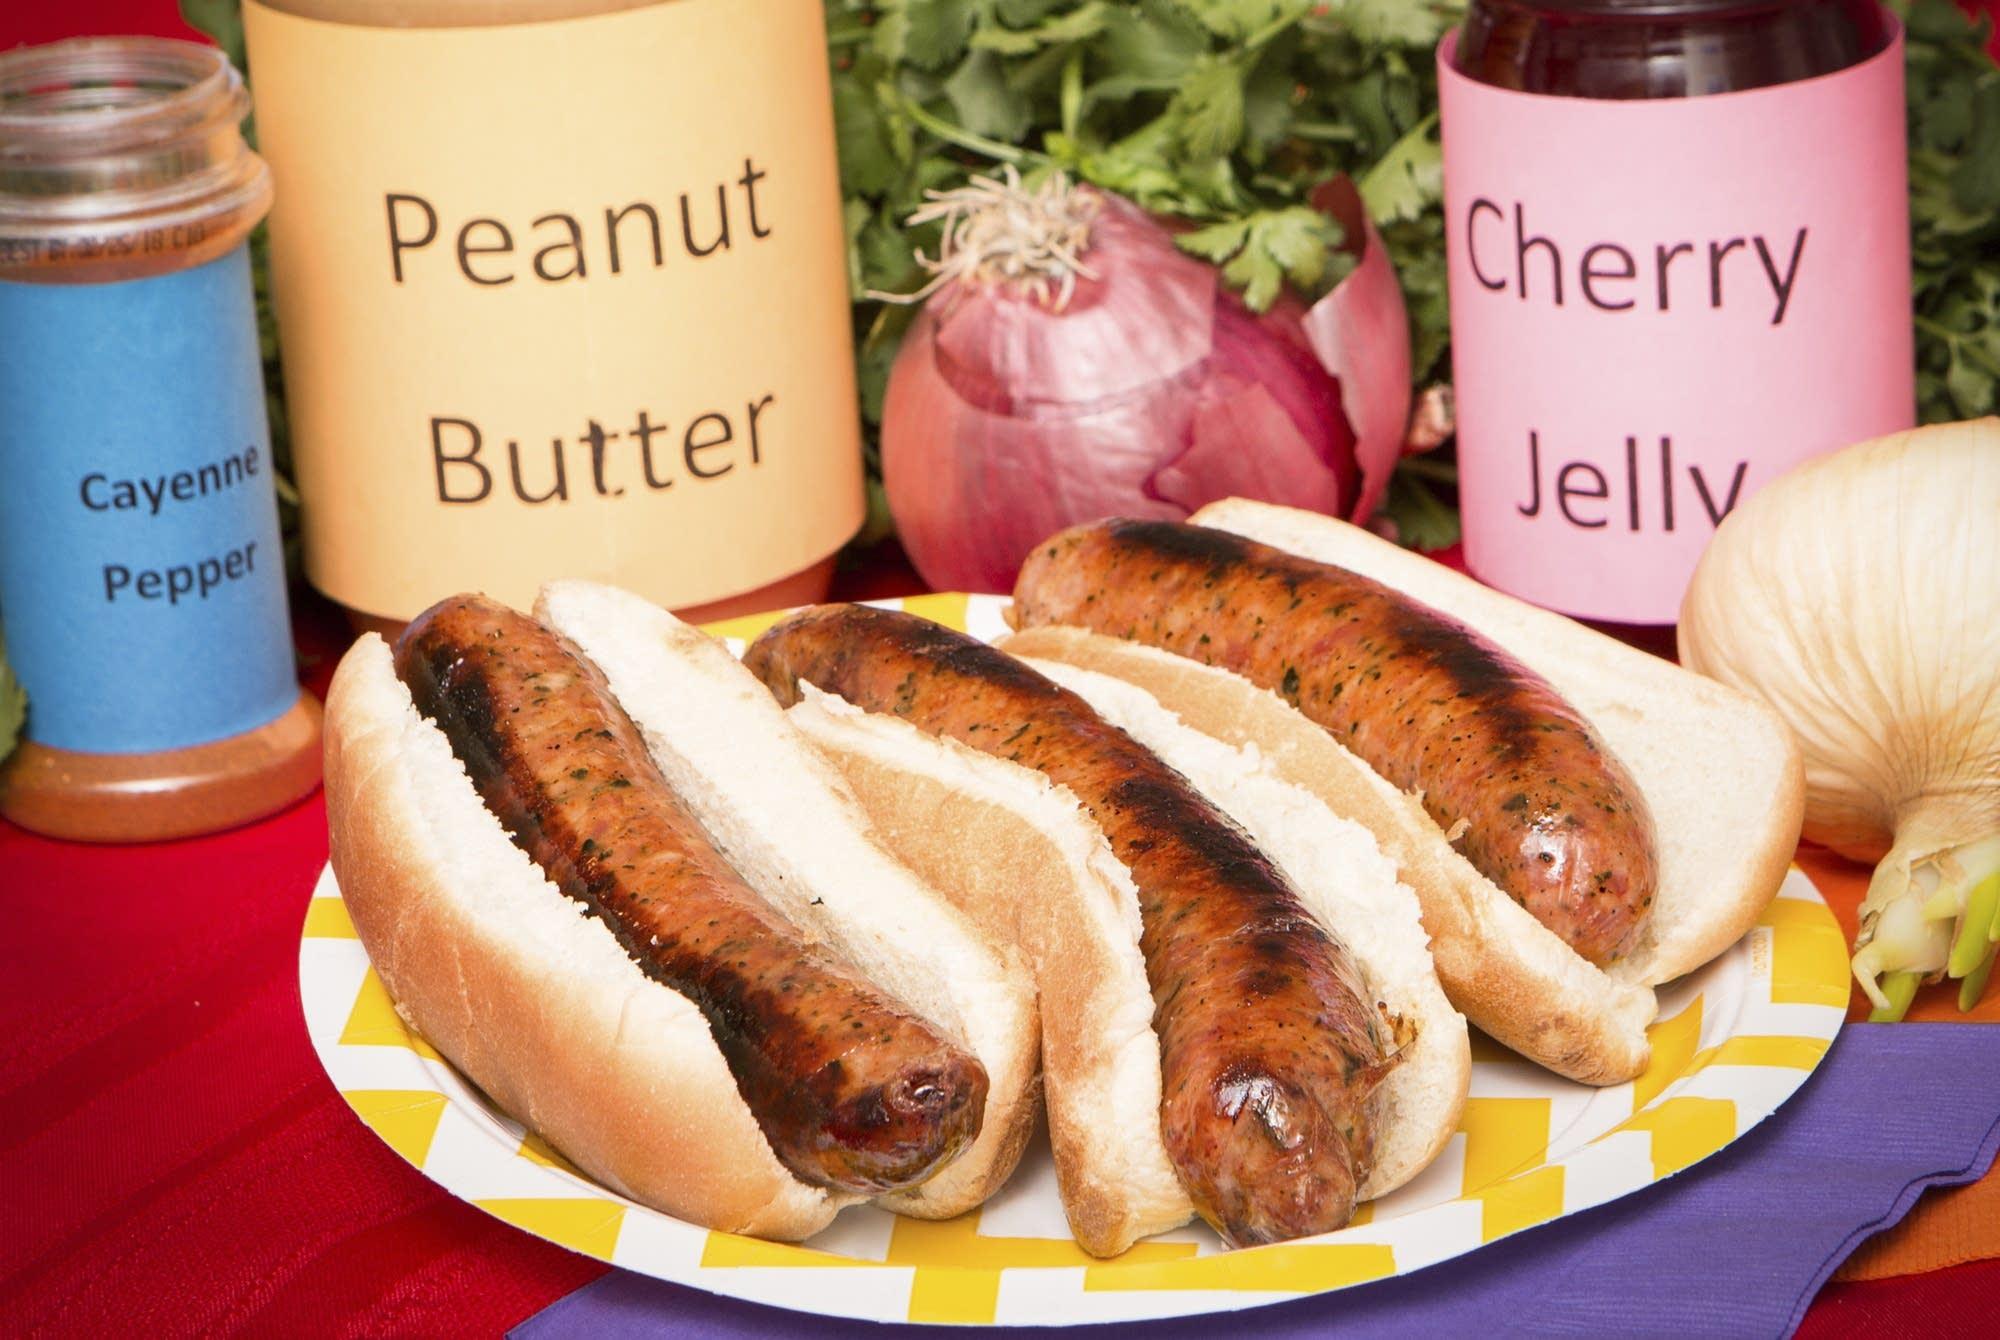 Zesty PB & J sausage